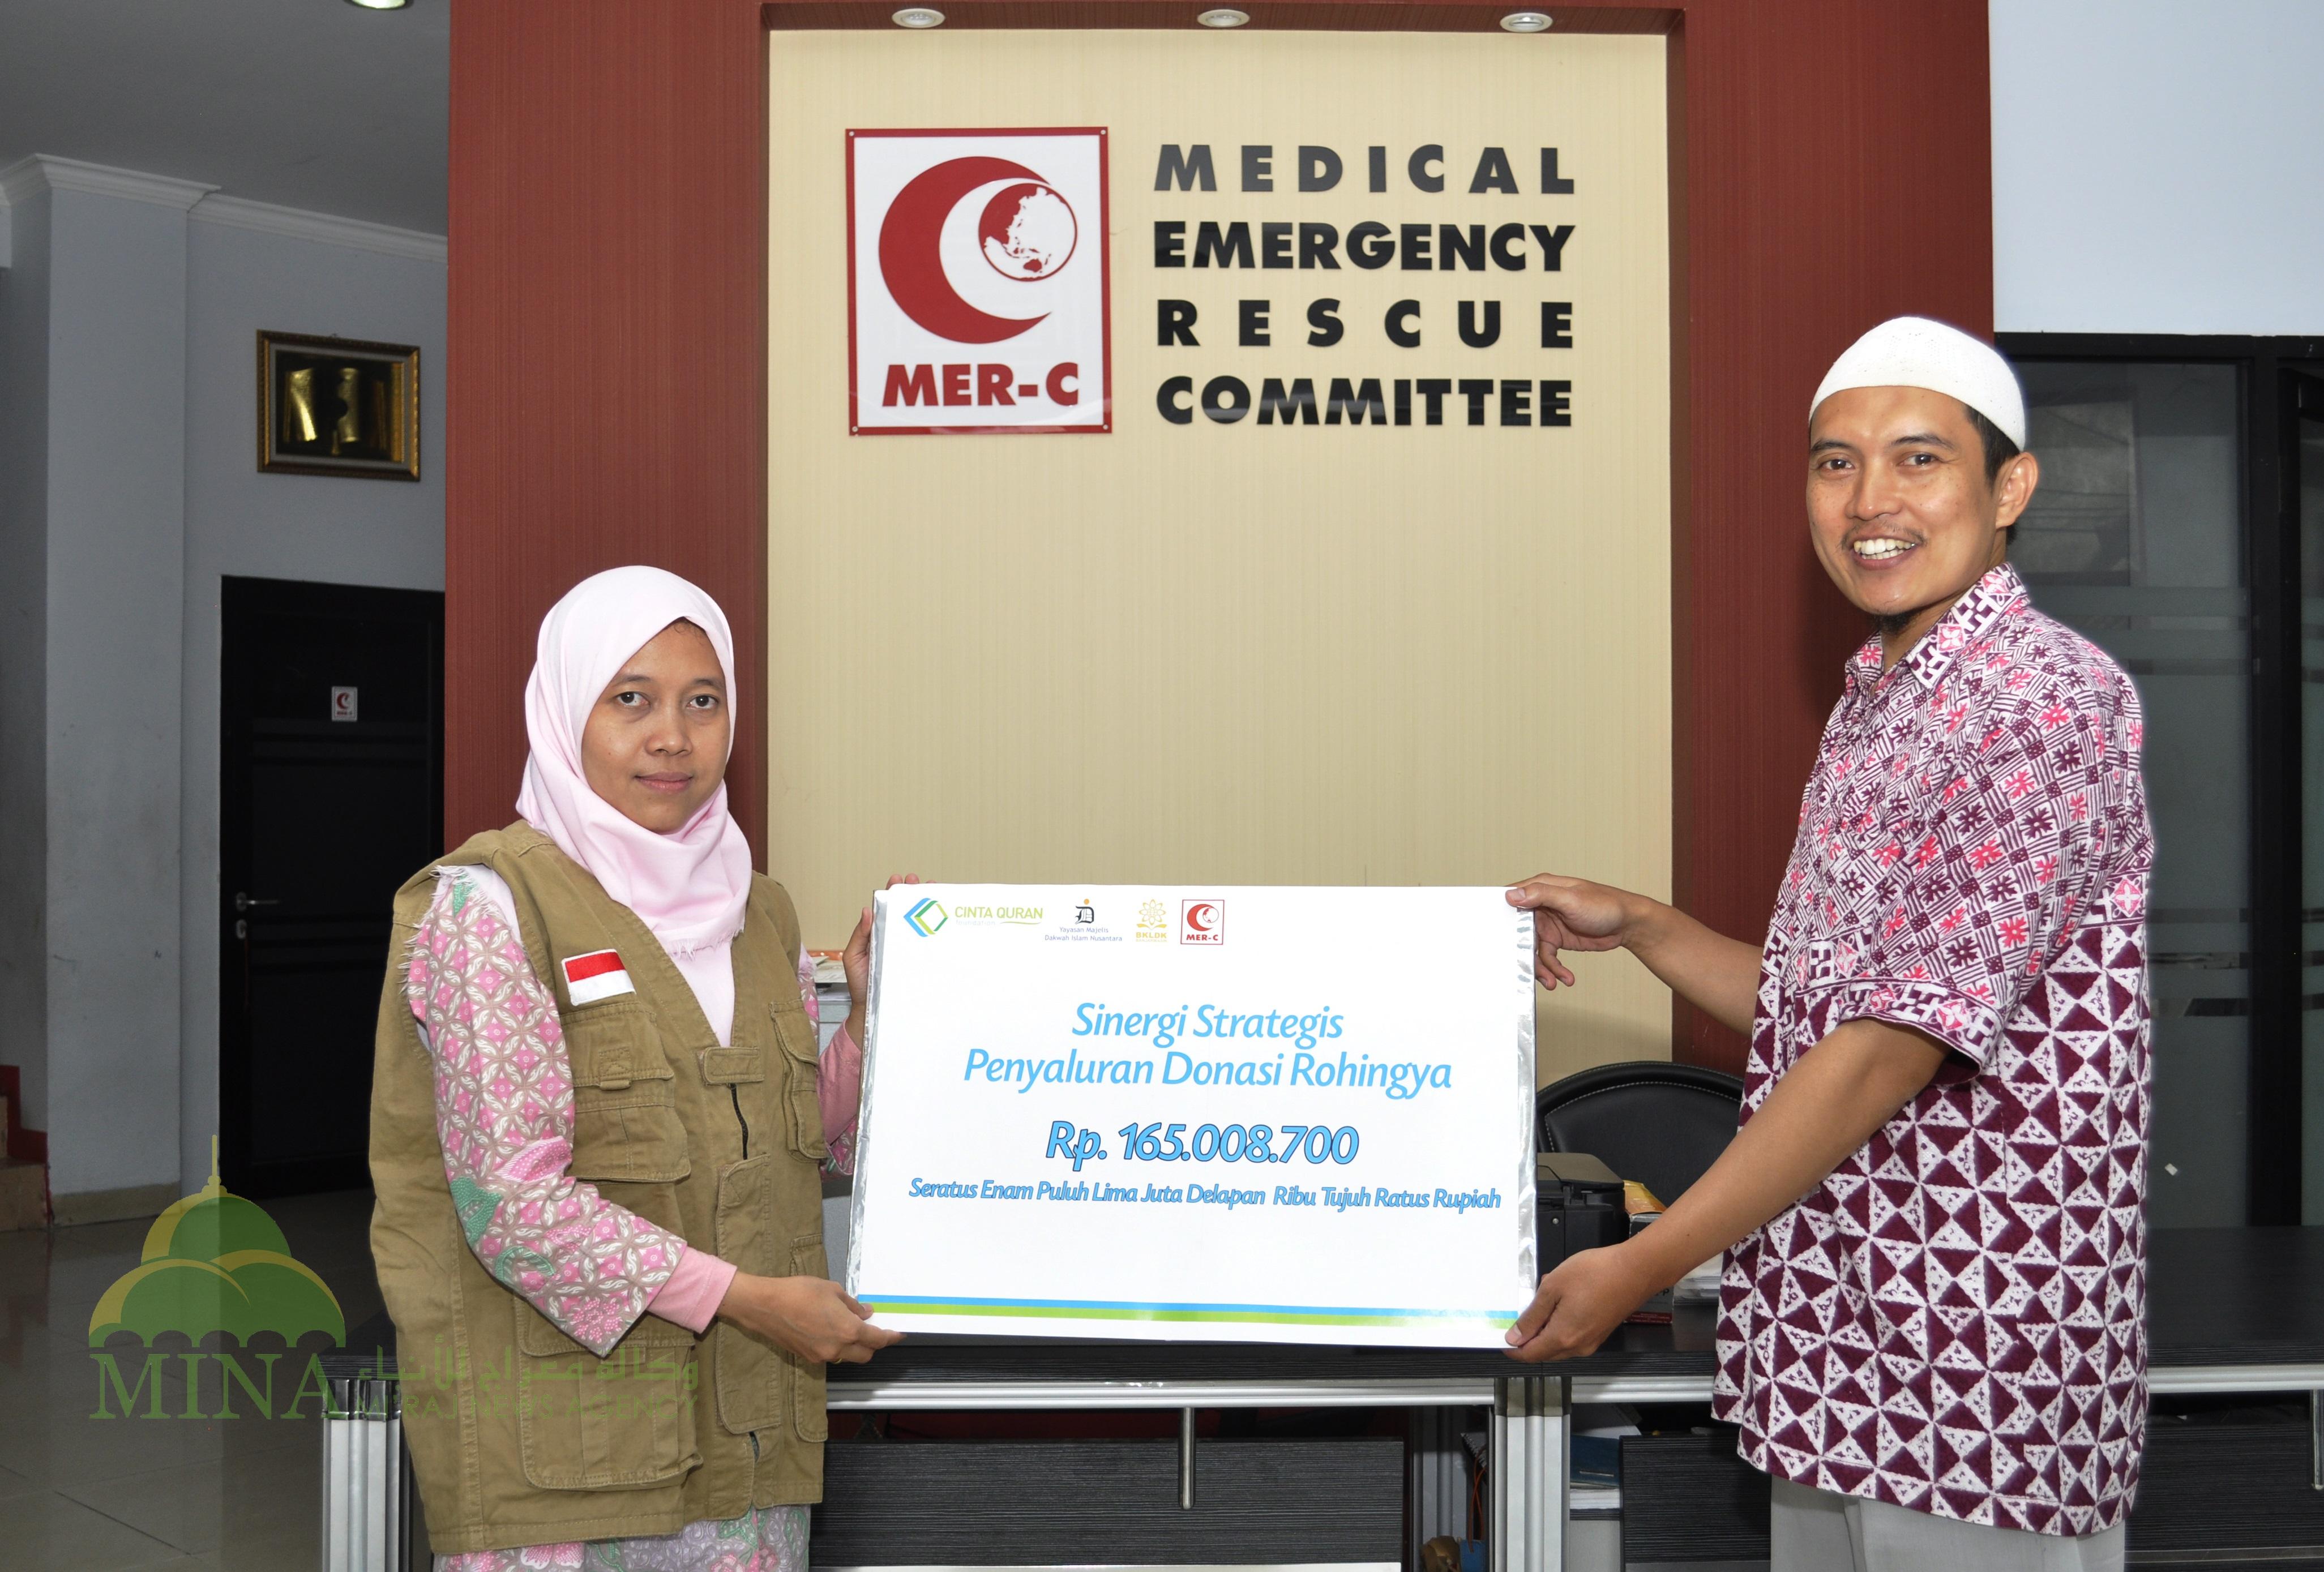 Cinta Quran Foundation Sumbang 165 Juta Untuk Rohingya Melalui MER-C